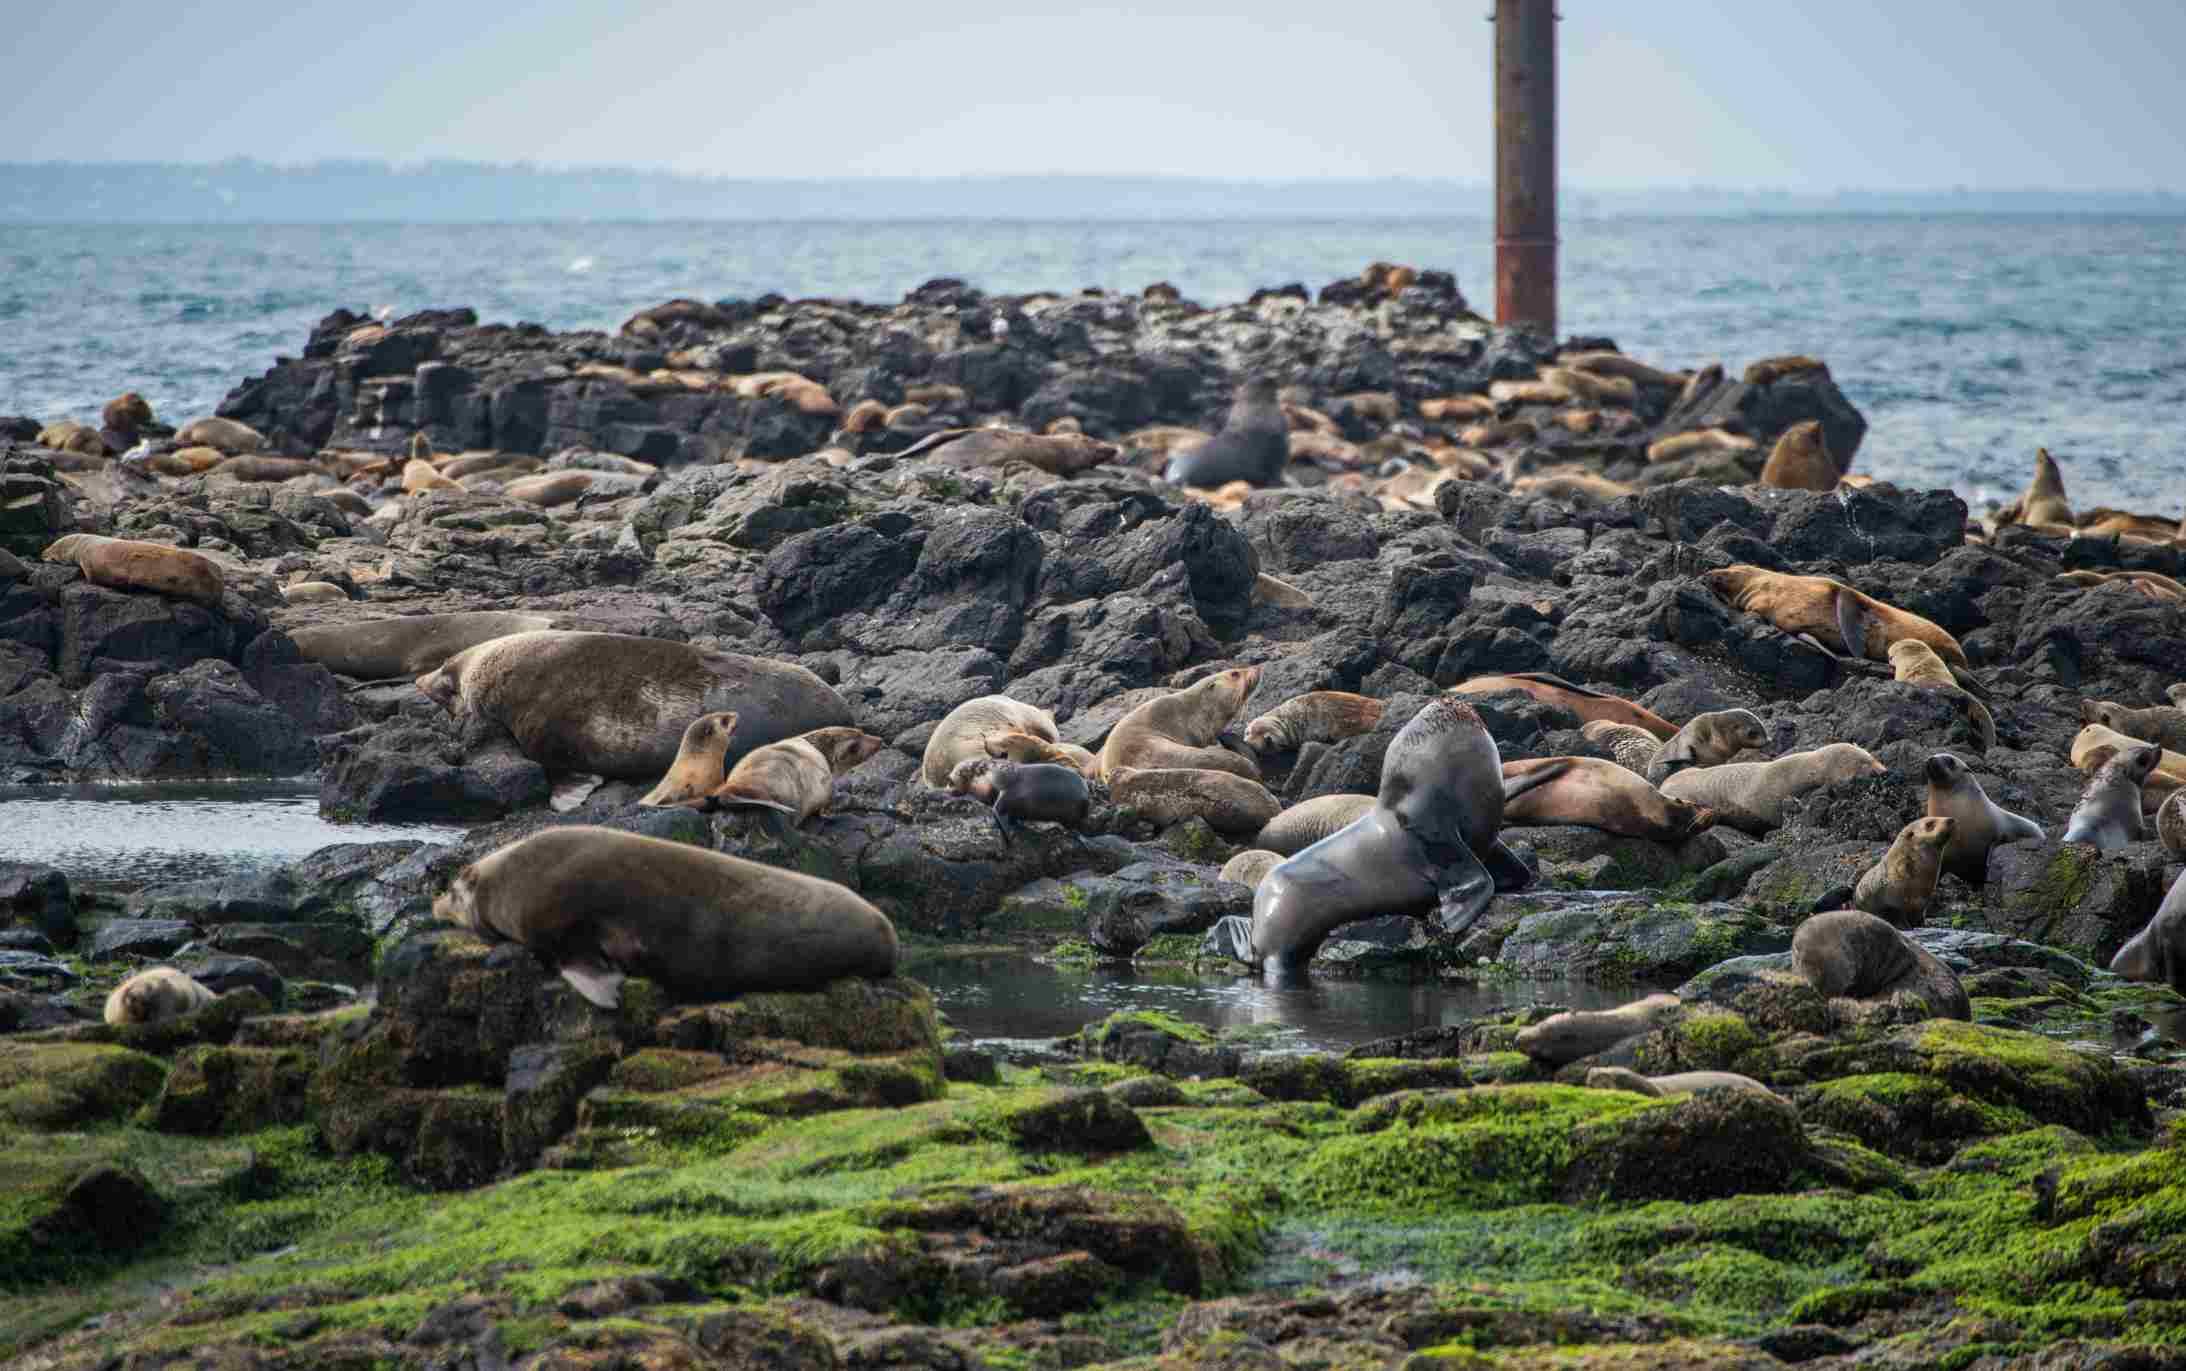 Seals colony on the seal rock of Philip island, Australia